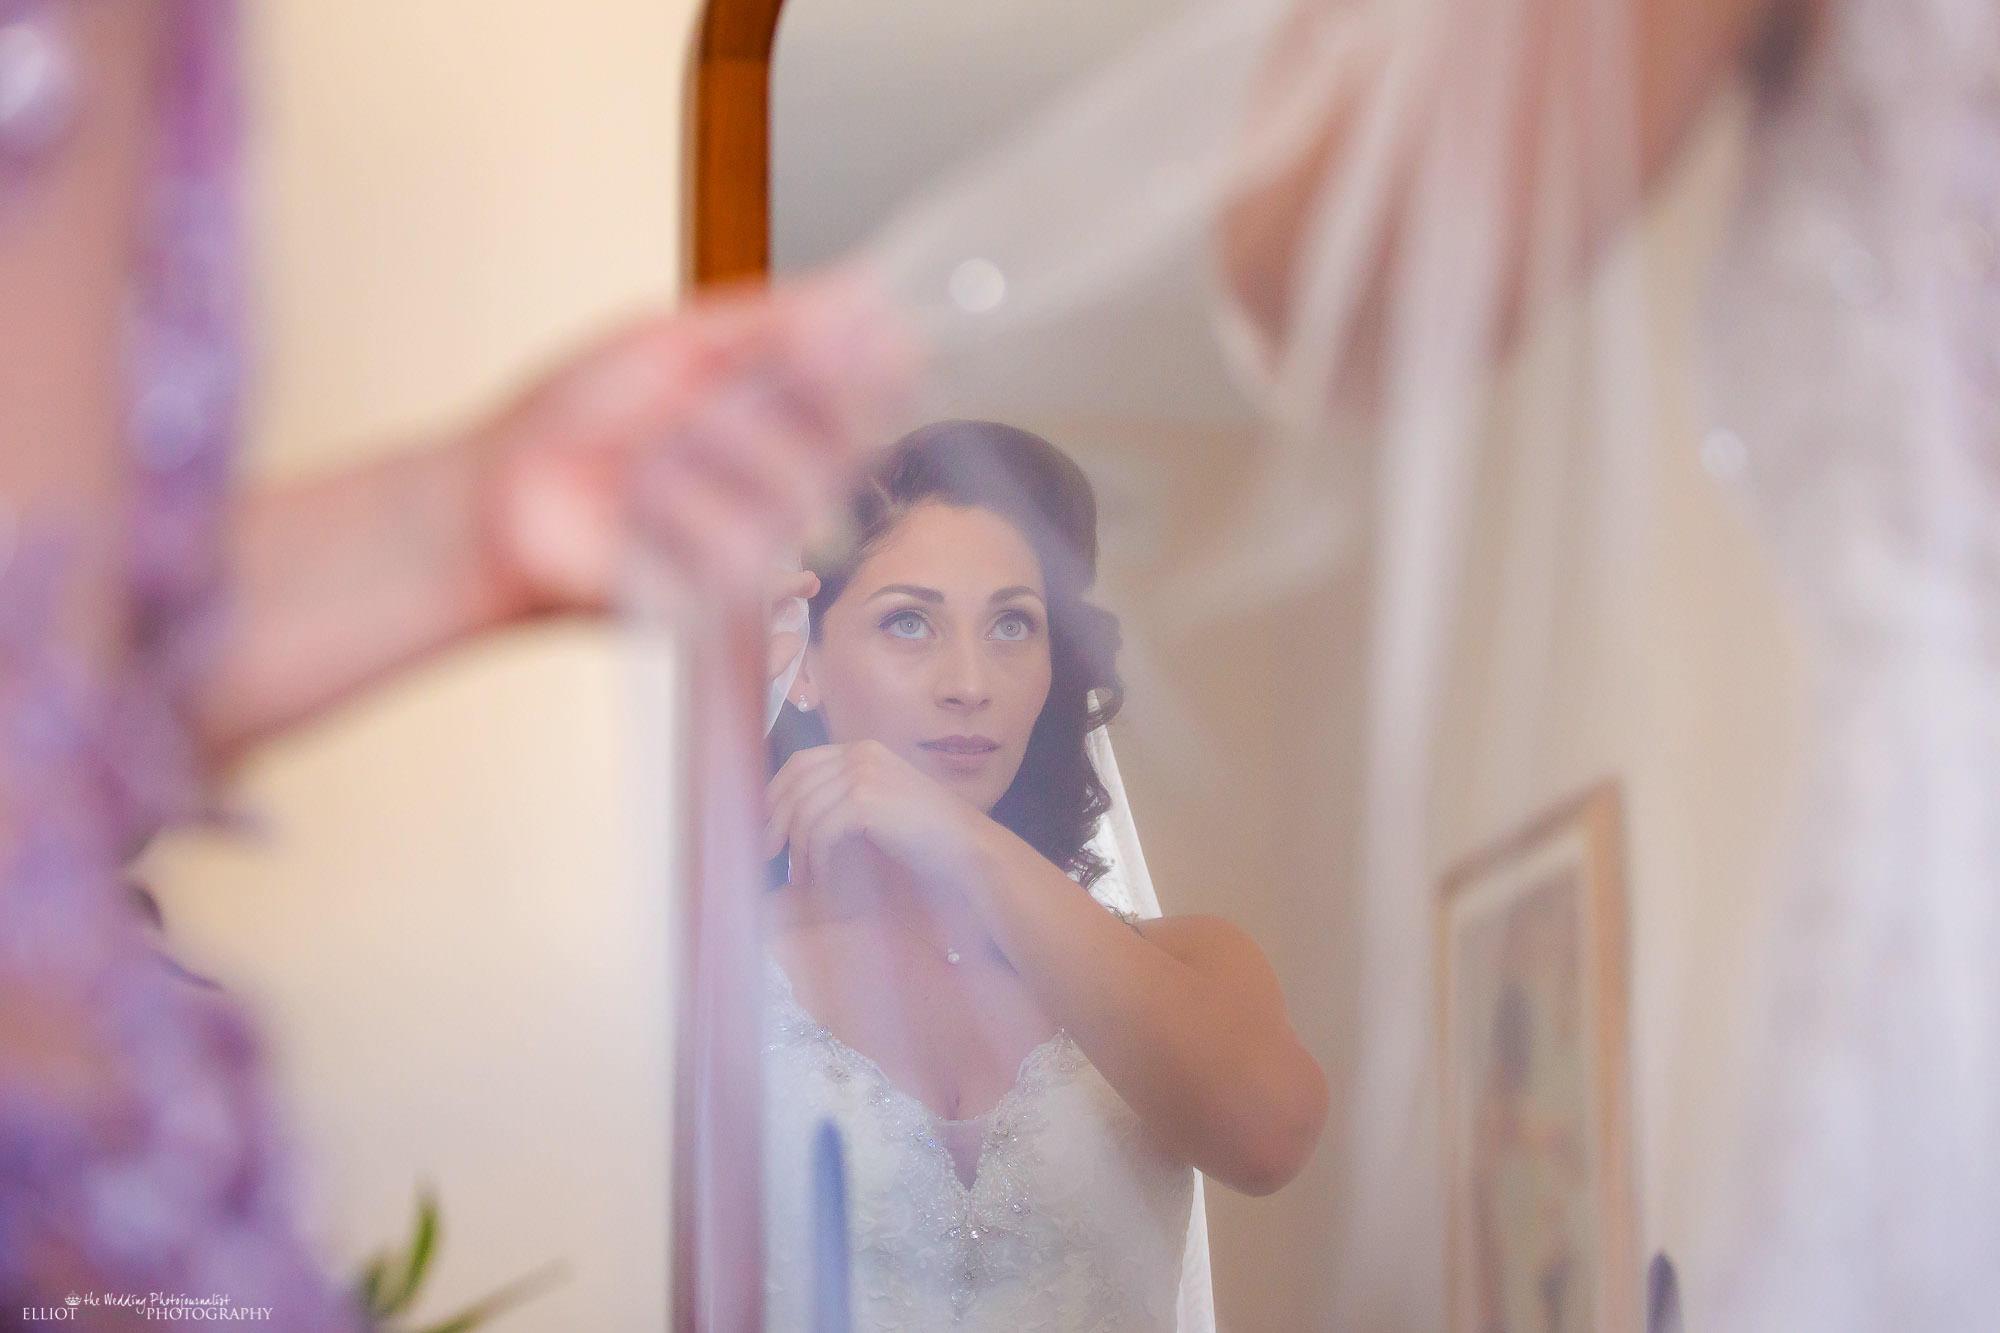 veil-bride-mother-creative-wedding-photography